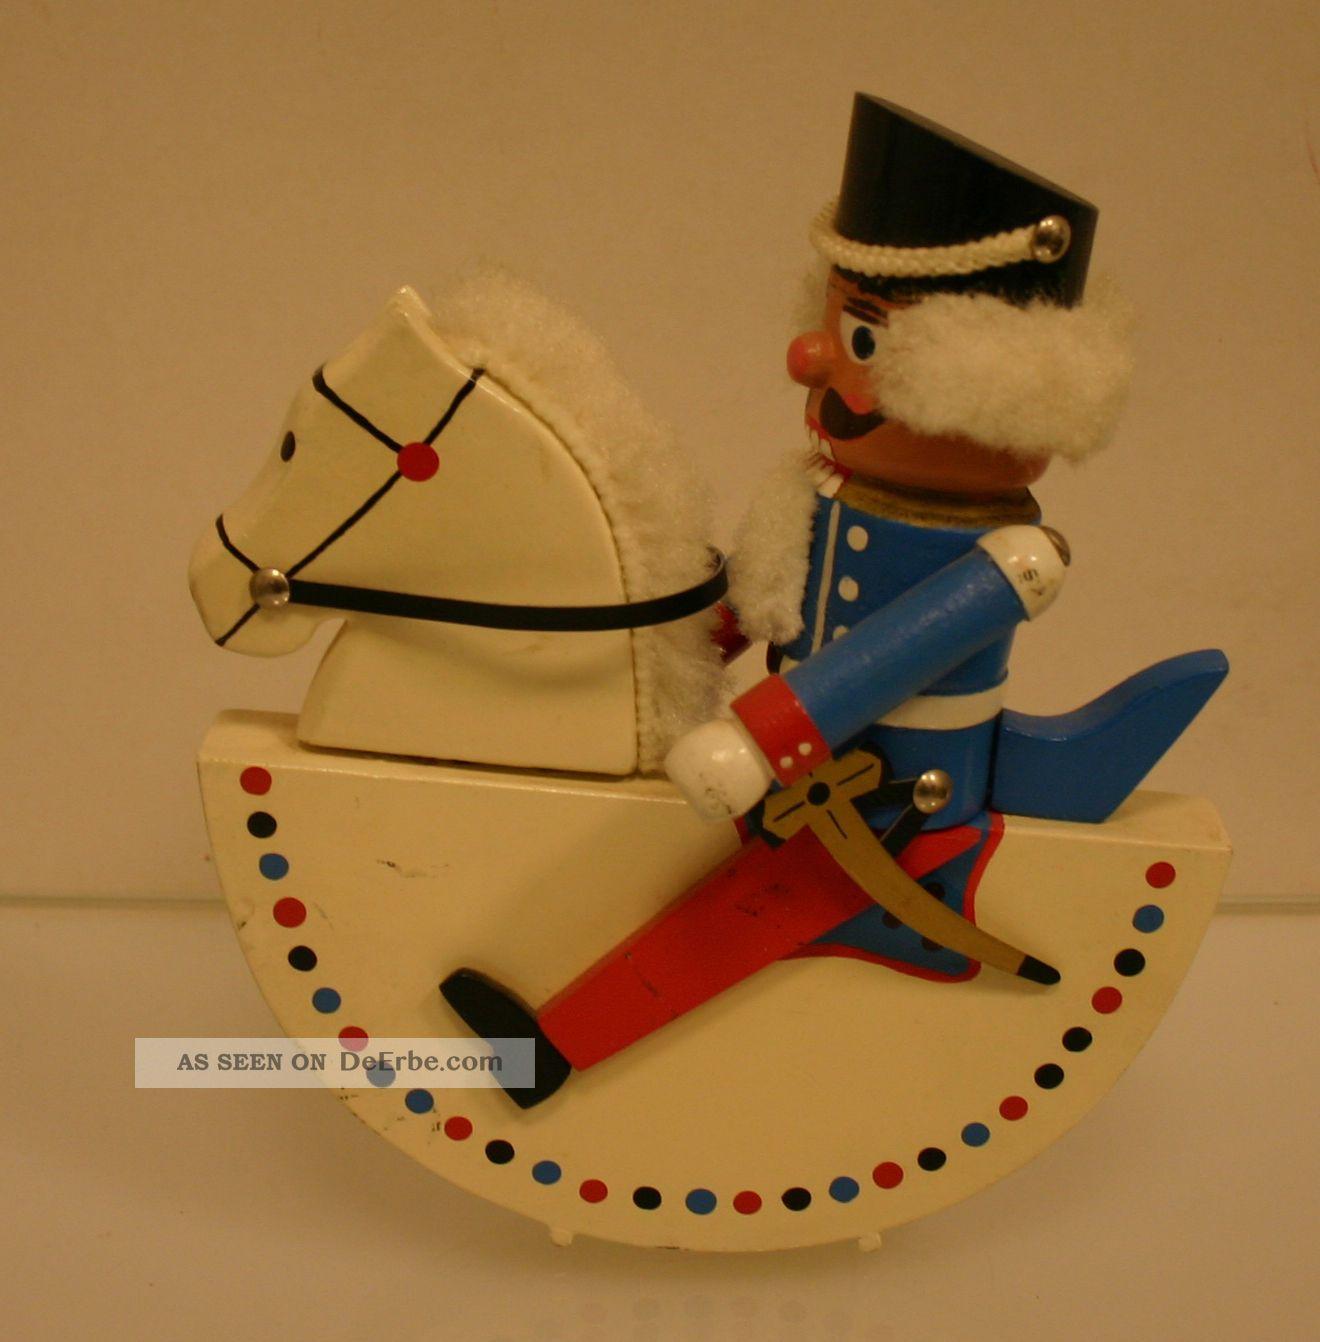 Erzgebirge, Nussknacker Soldat Auf Schaukelpferd, Alt, Holz